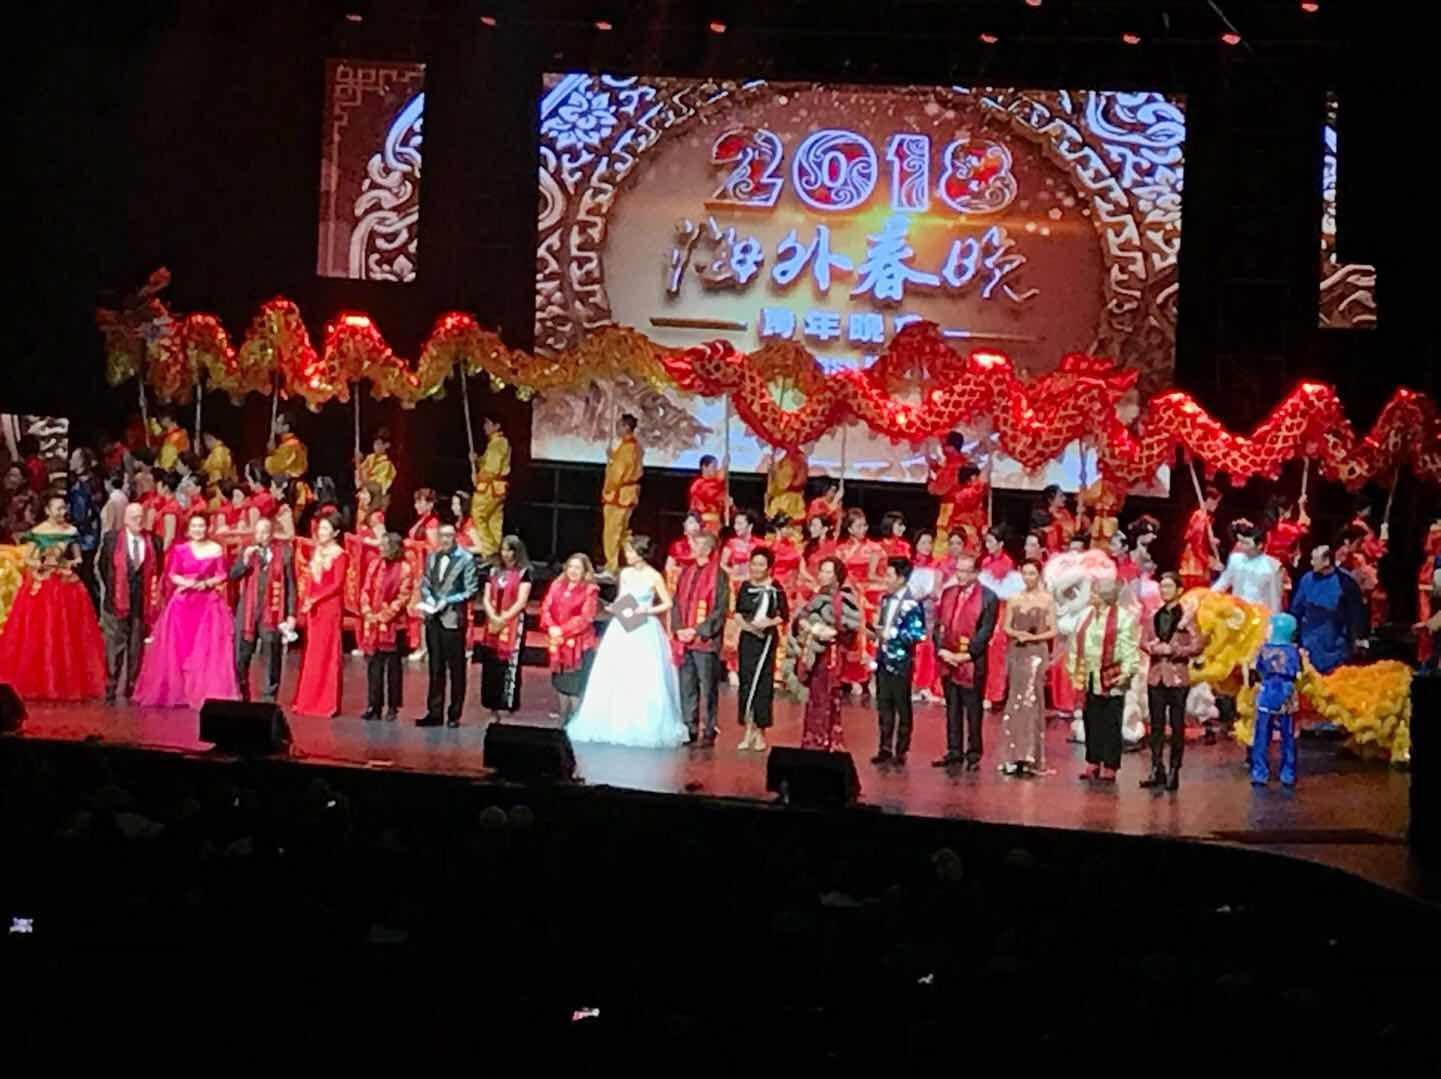 wayland-li-wushu-sony-centre-spring-festival-2018-gala-toronto-canada-05.jpg